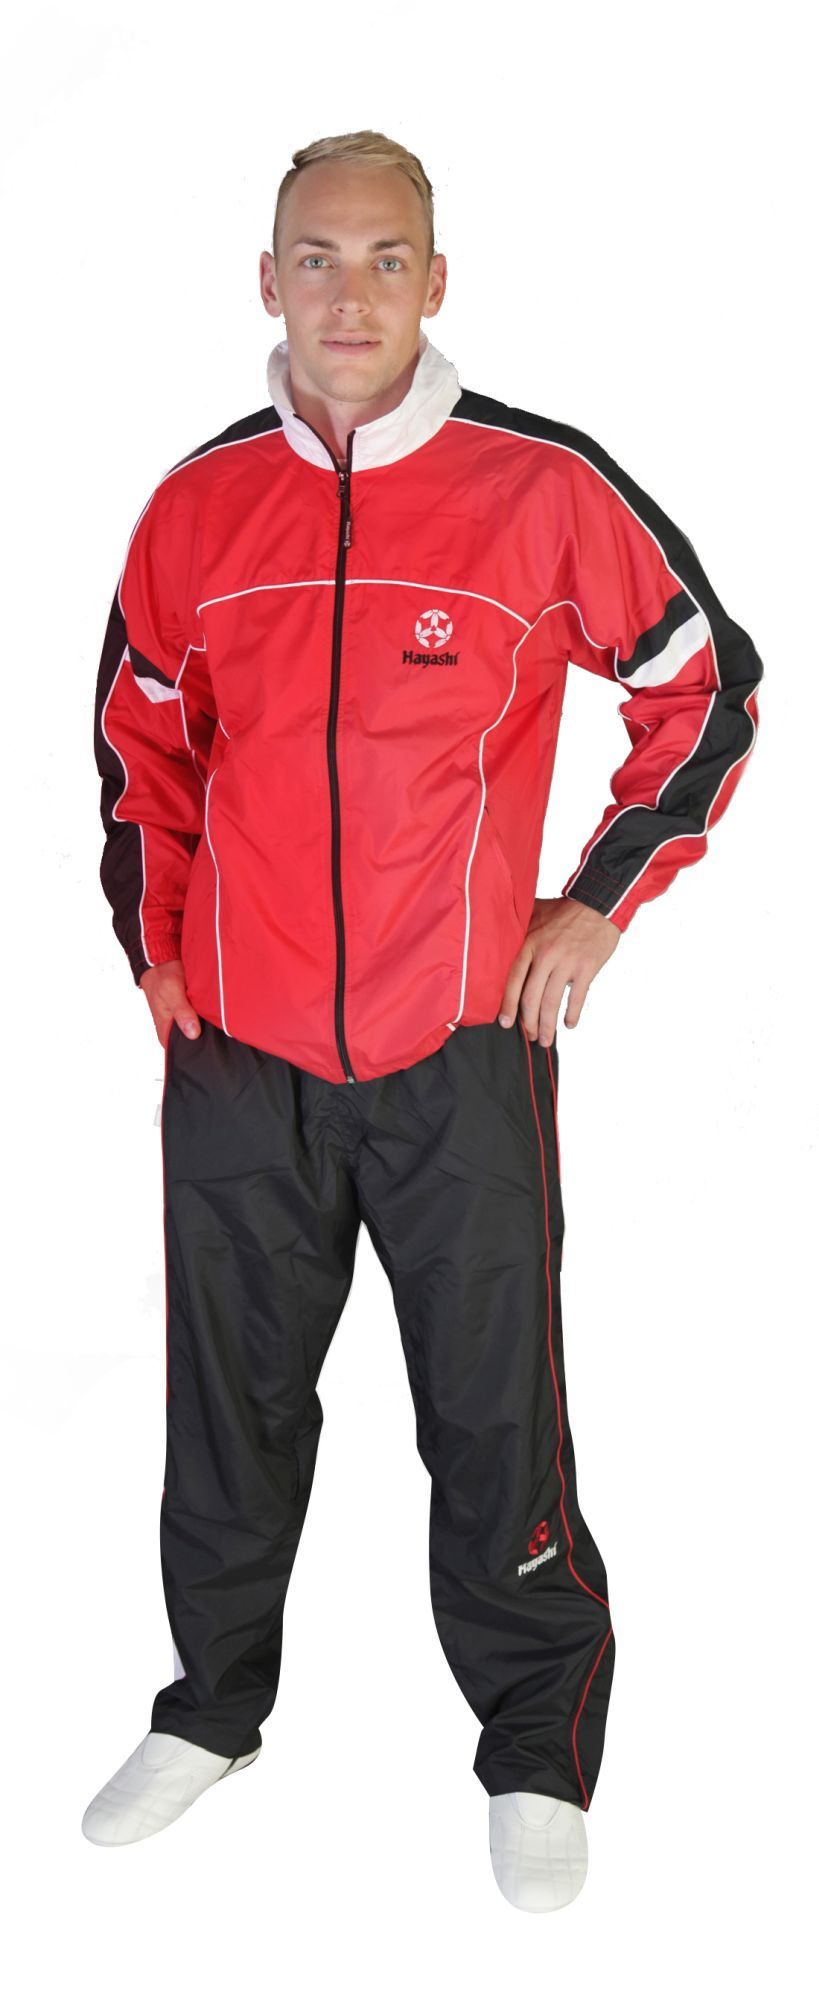 Hayashi Trainingspak met zwarte broek (Rood / Zwart)